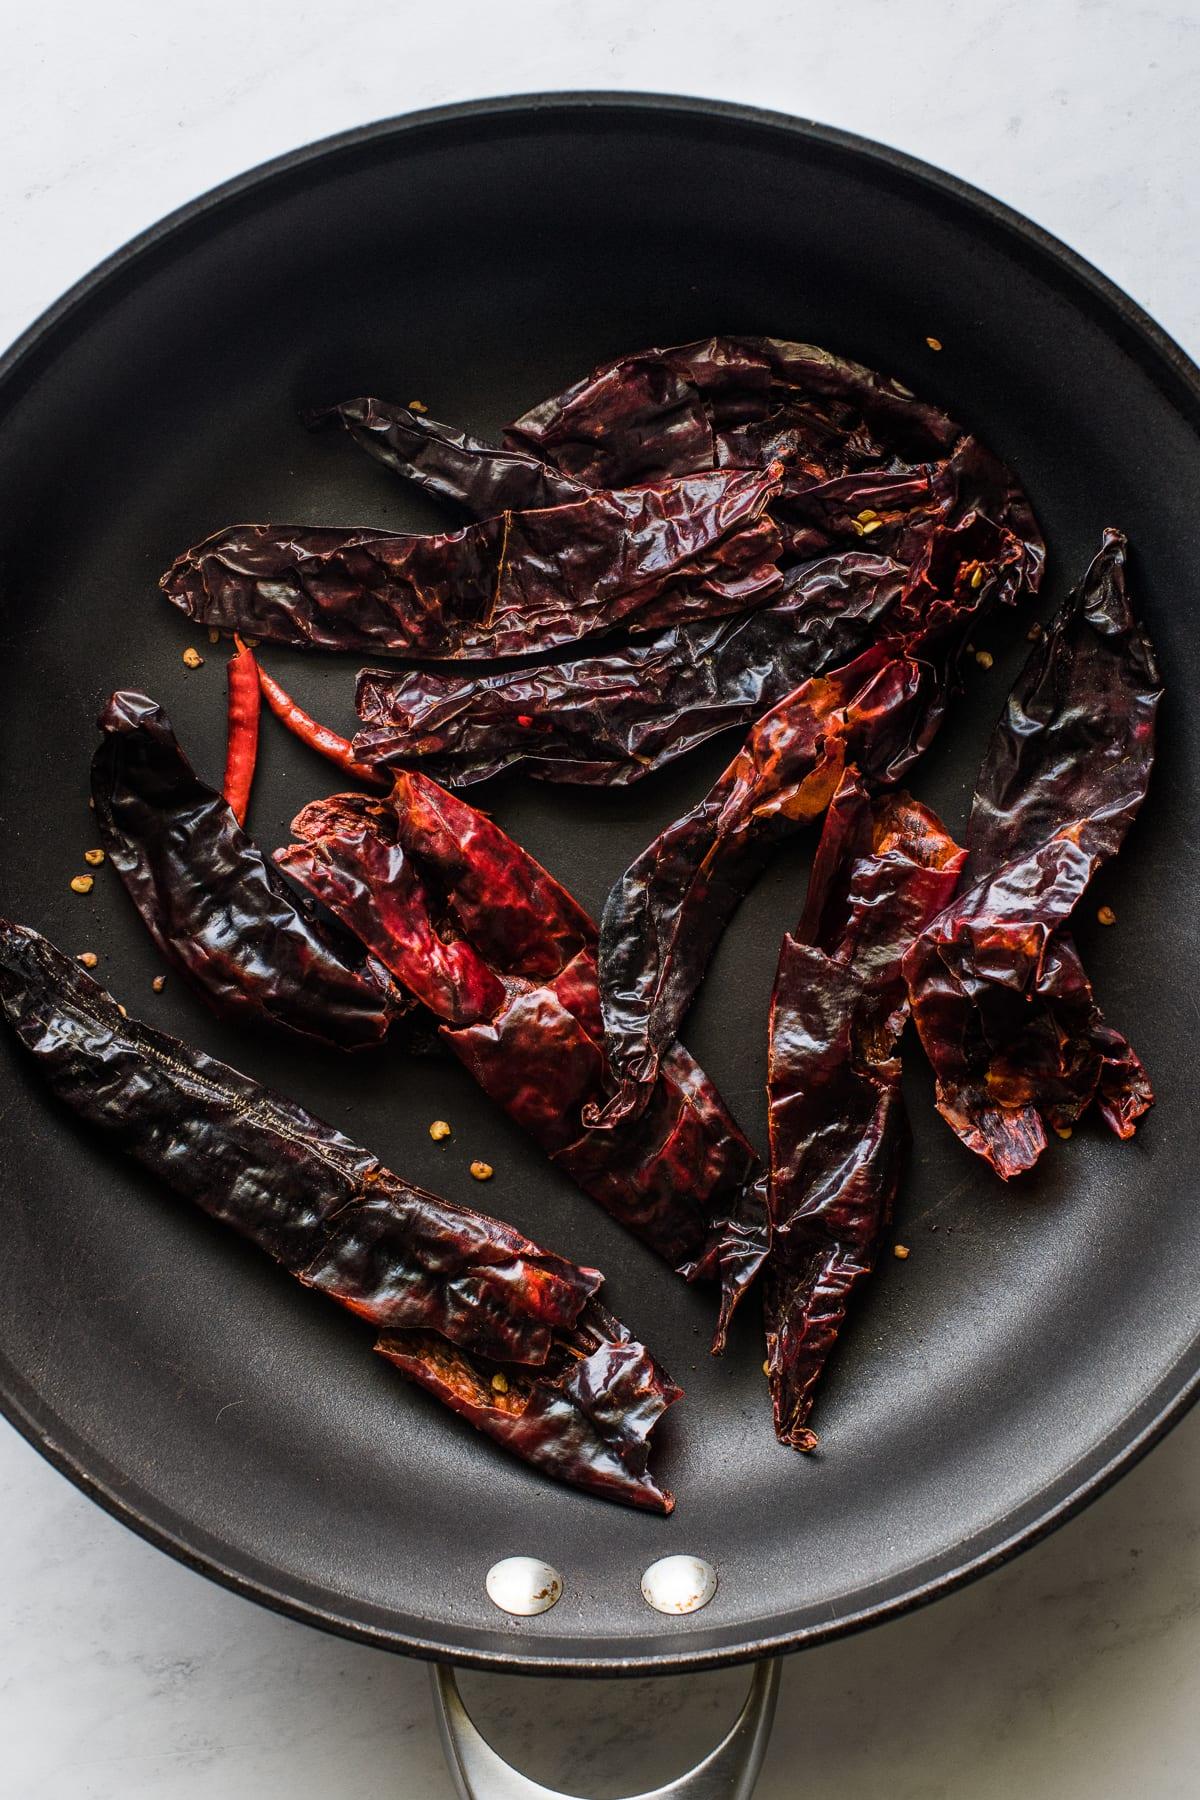 Guajillo chiles toasting on a skillet.